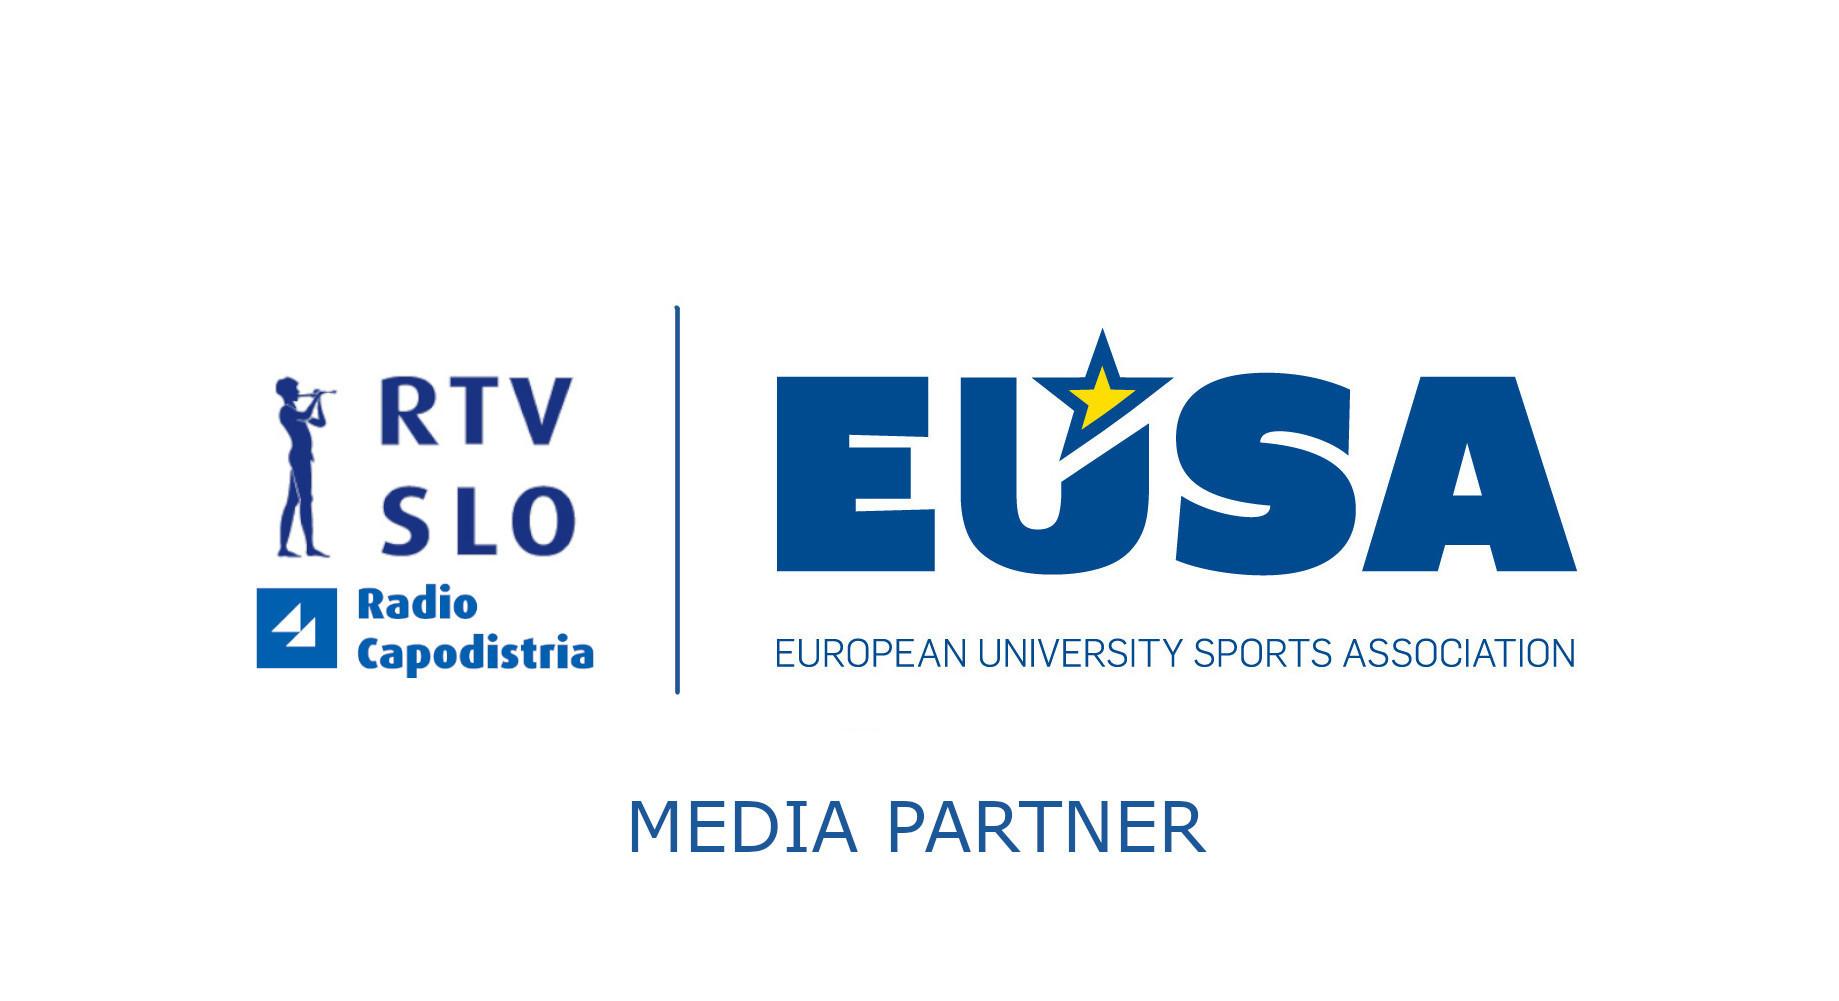 EUSA sign Memorandum of Understanding with Slovenian radio station